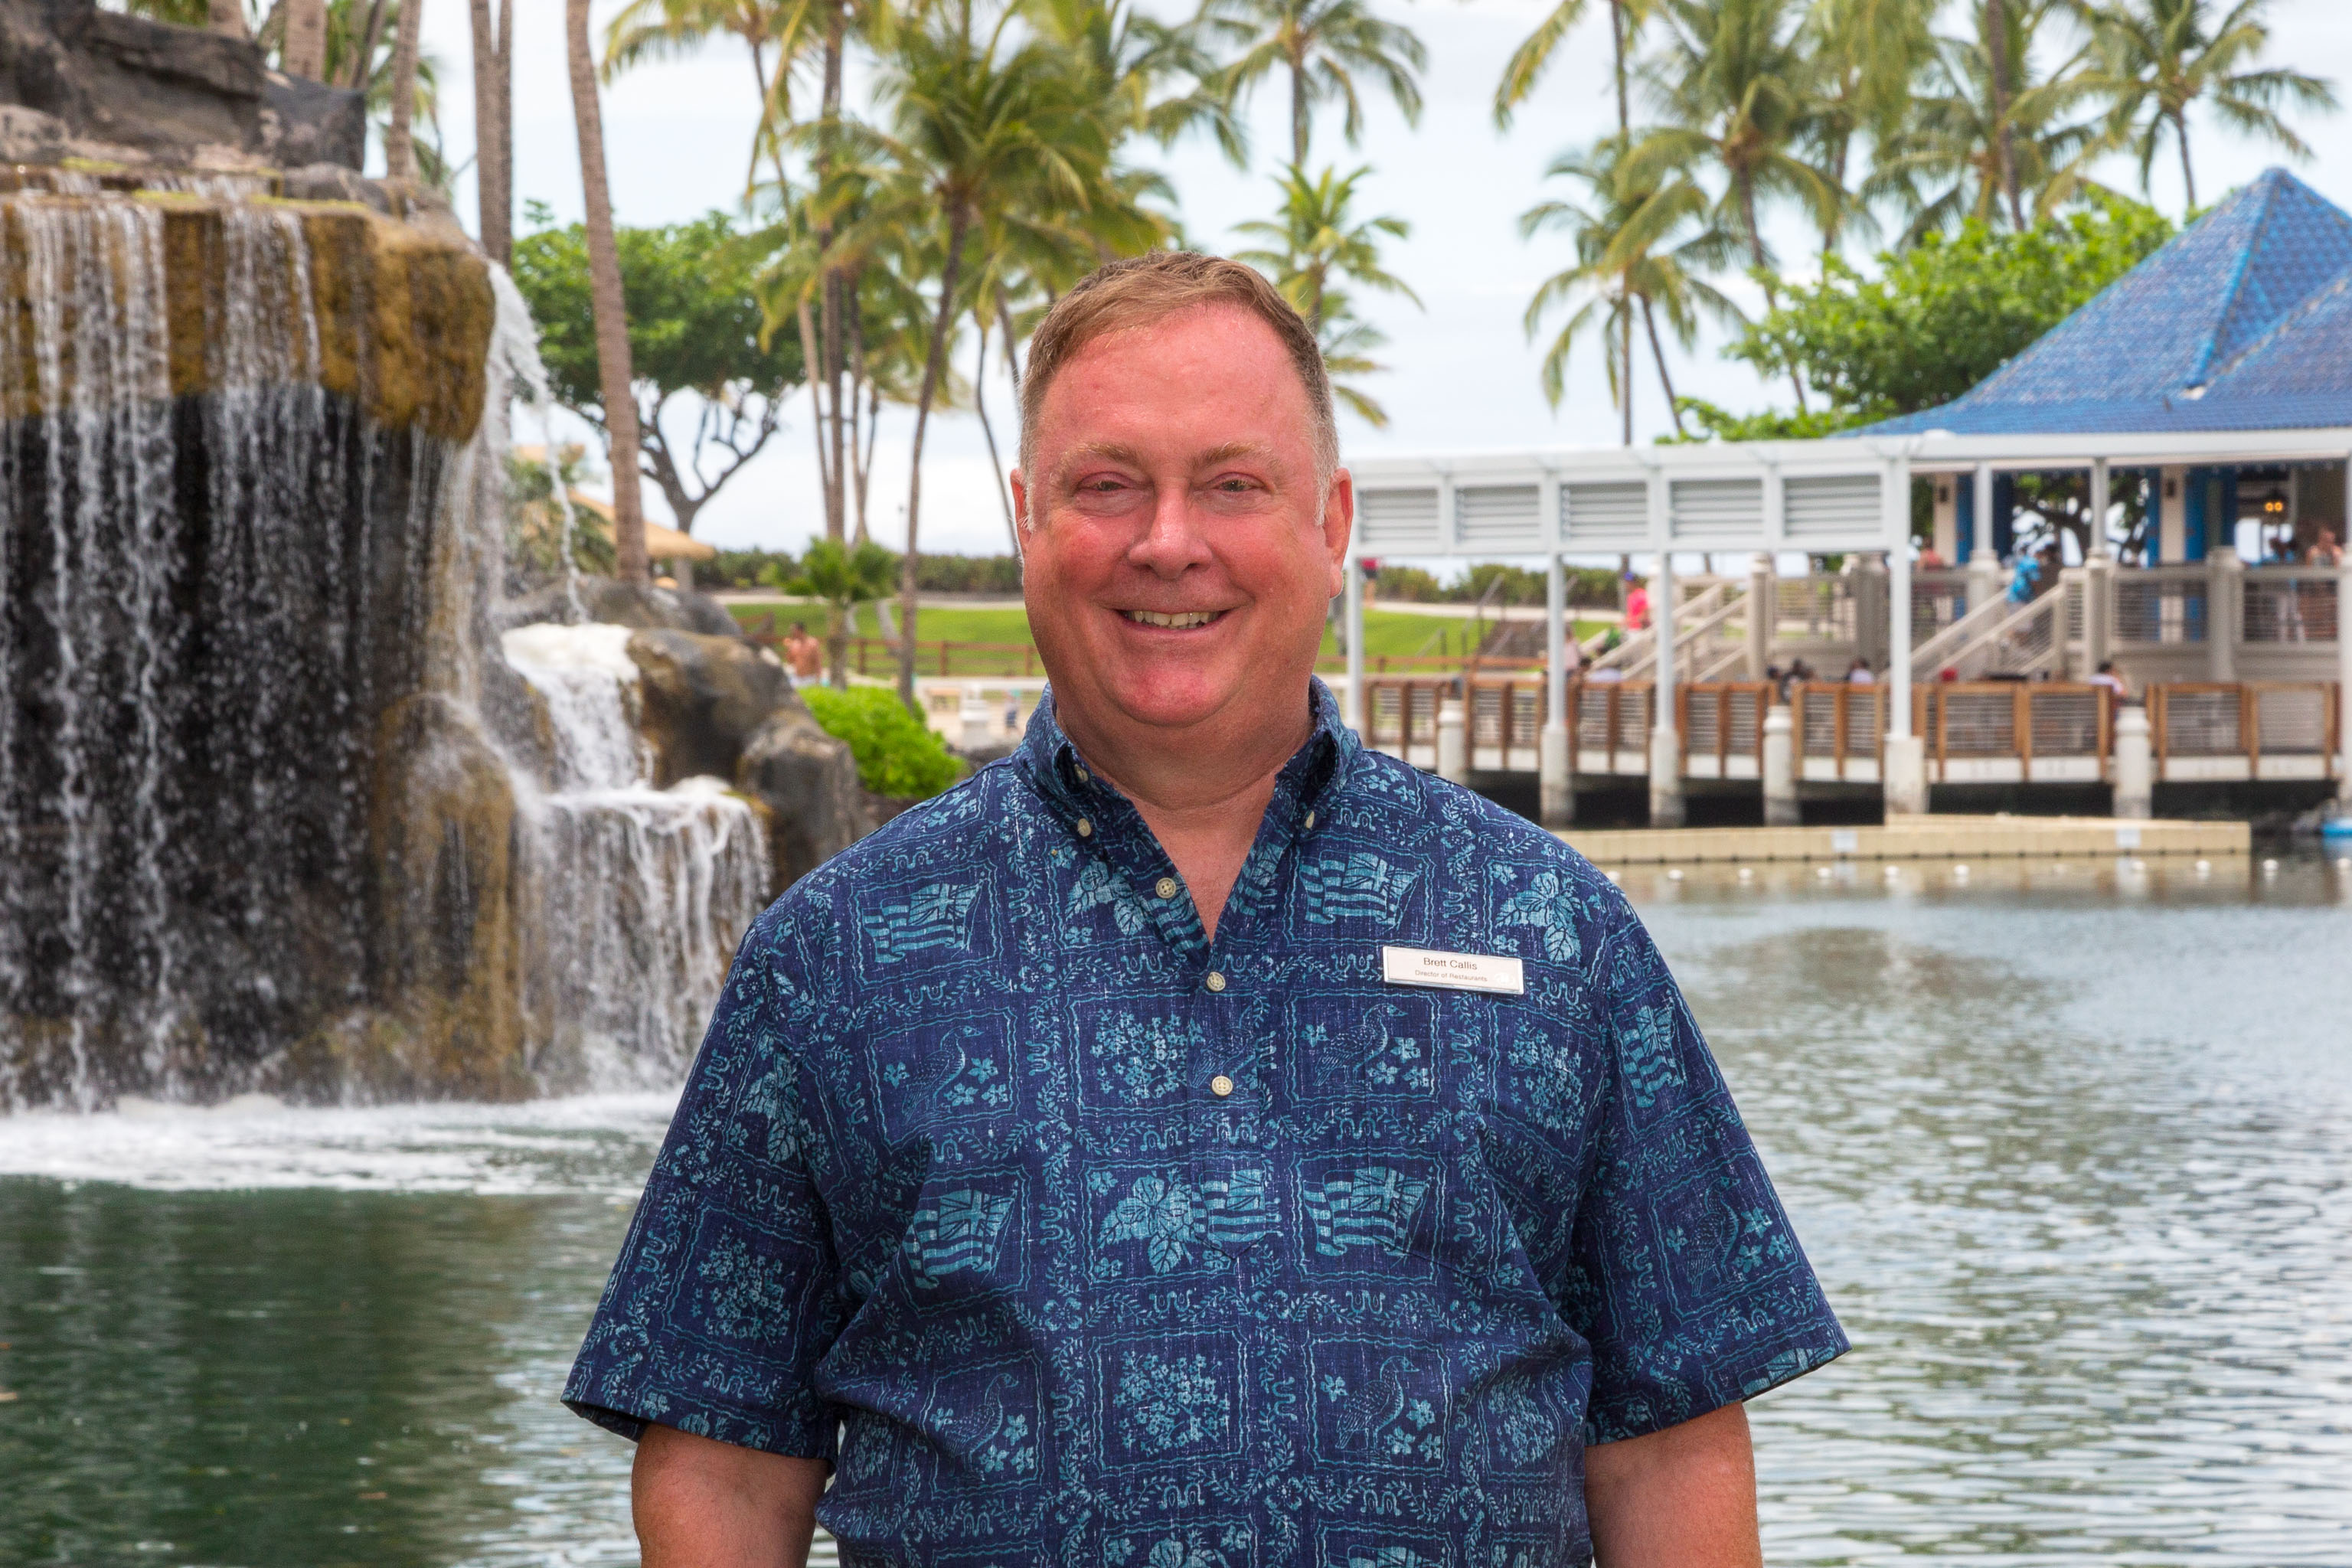 In His New Position Brett Callis Will Oversee Key Restaurants At The Hilton Waikoloa Village Pc Courtesy Photo